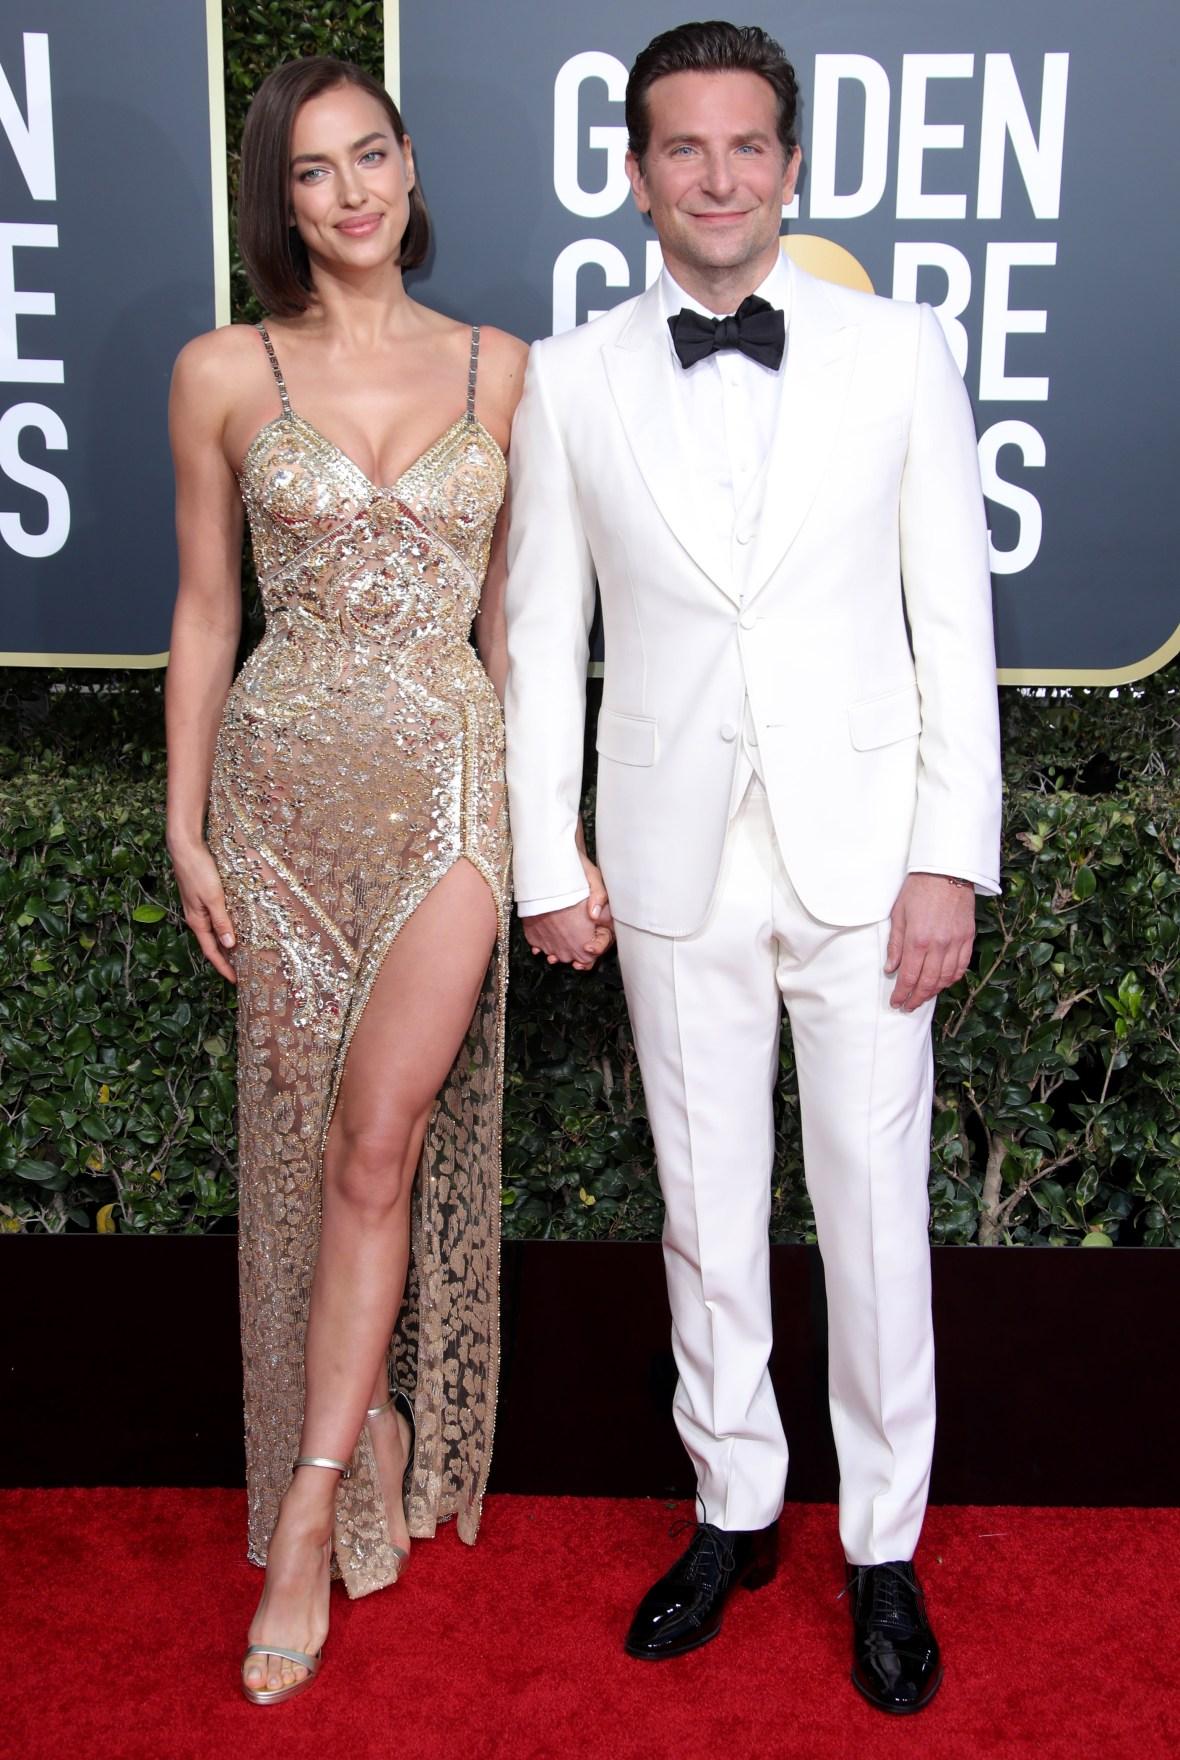 Irina Shayk Gushes Over Ex Bradley Cooper in Rare Interview